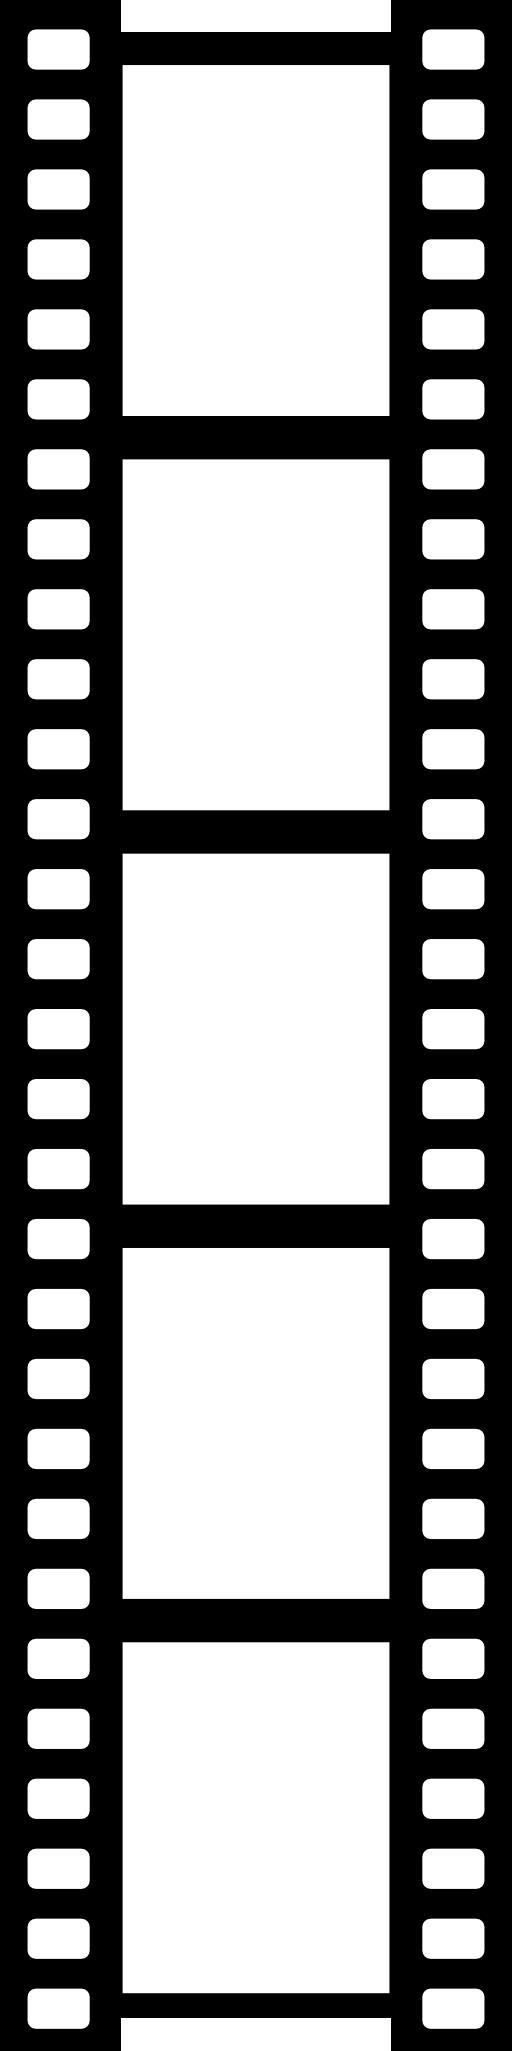 Film clipart. Clip art free panda